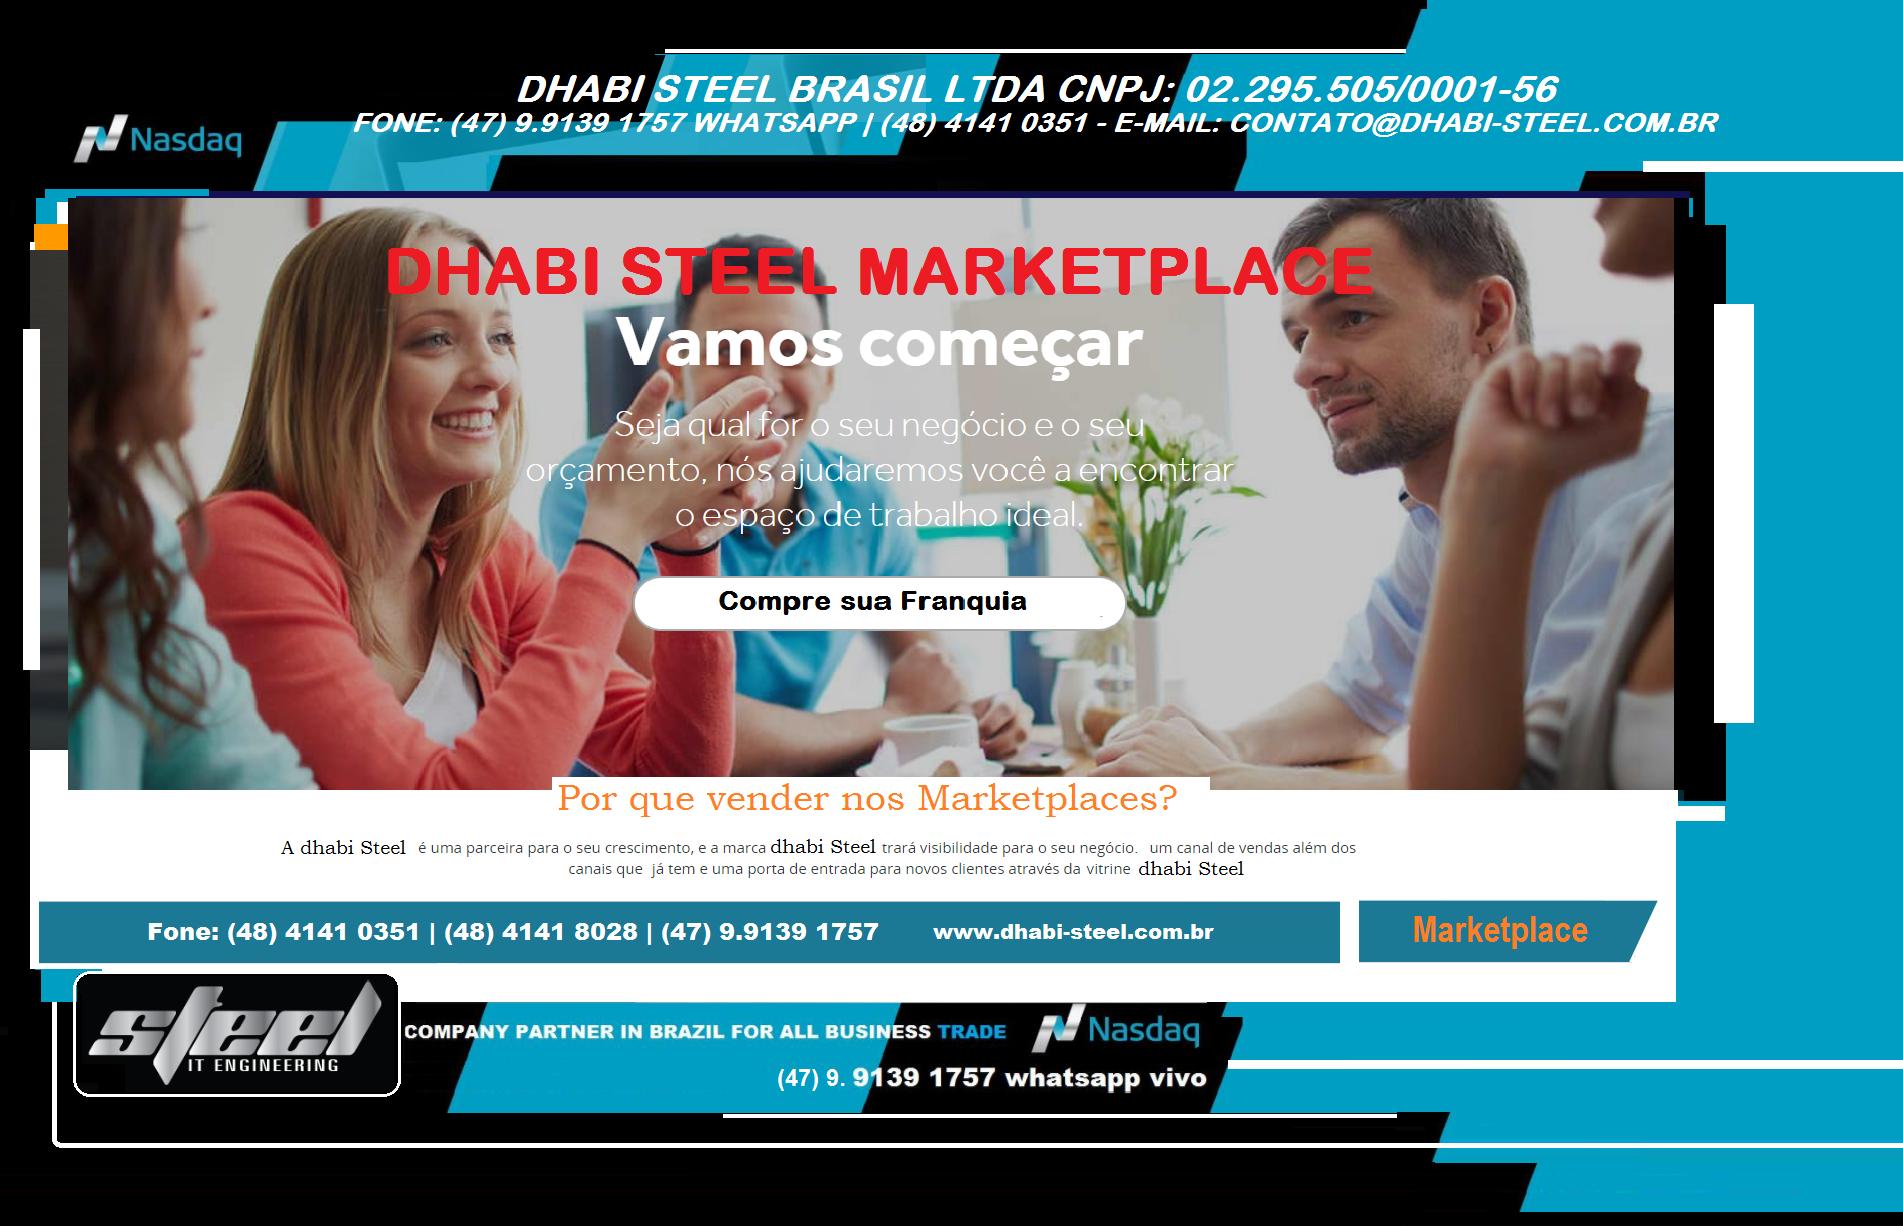 DHABI STEEL B2C